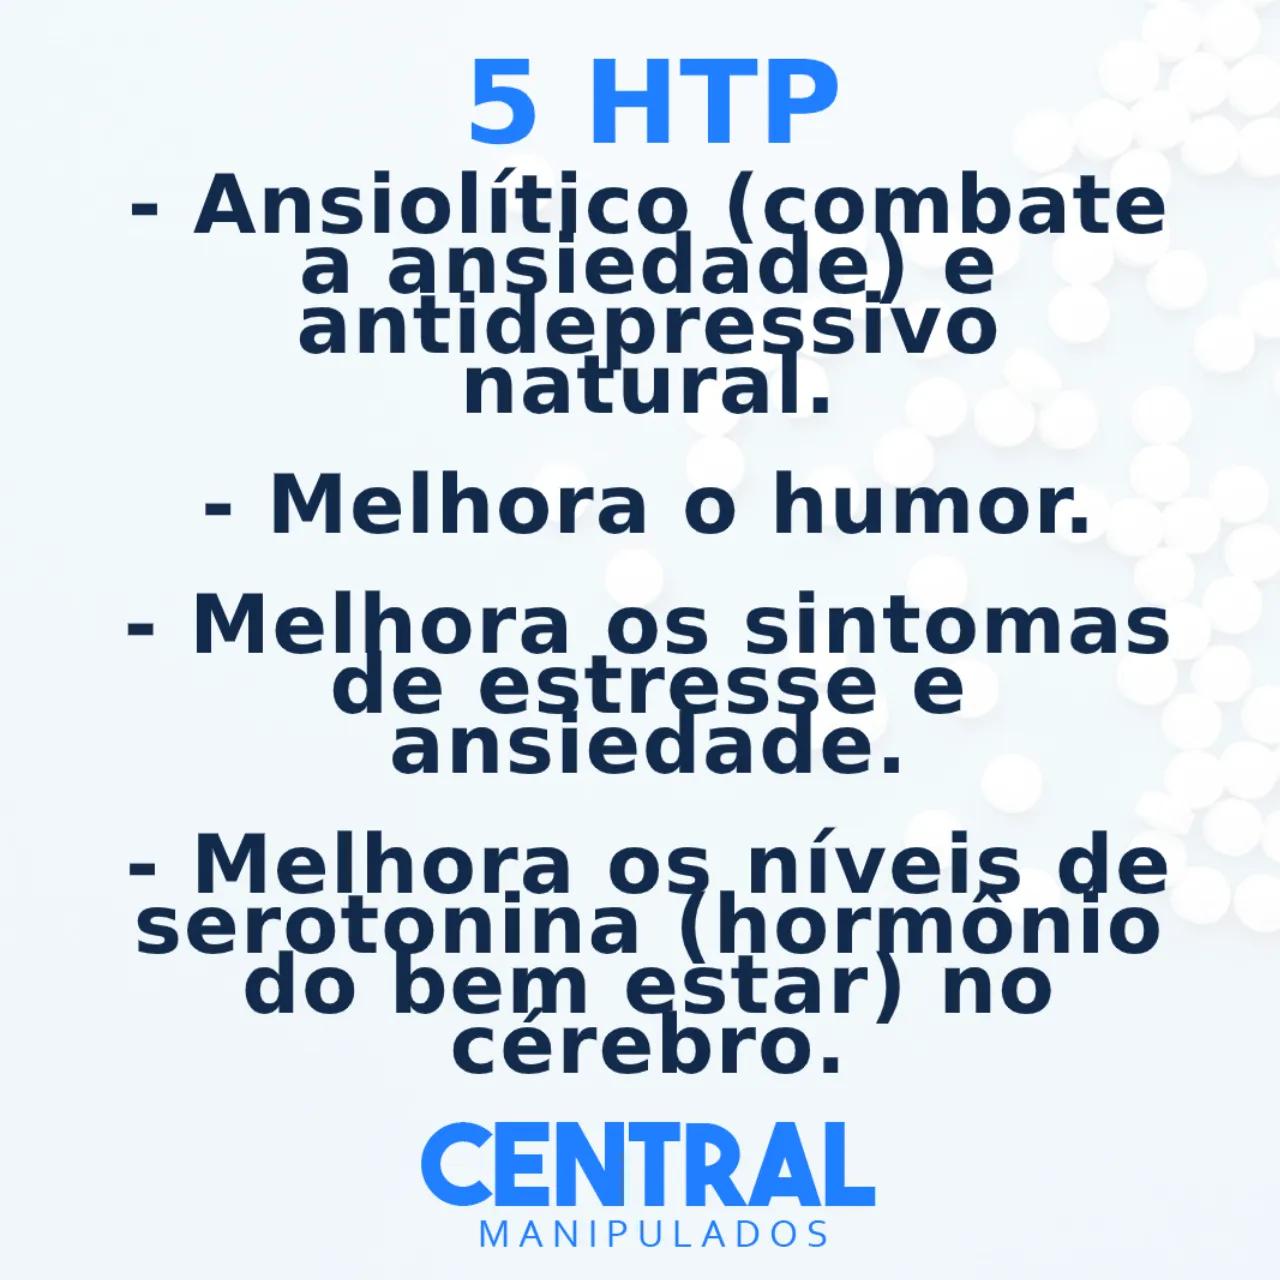 5 HTP 50mg - 60 cápsulas - Ansiolítico e antidepressivo natural